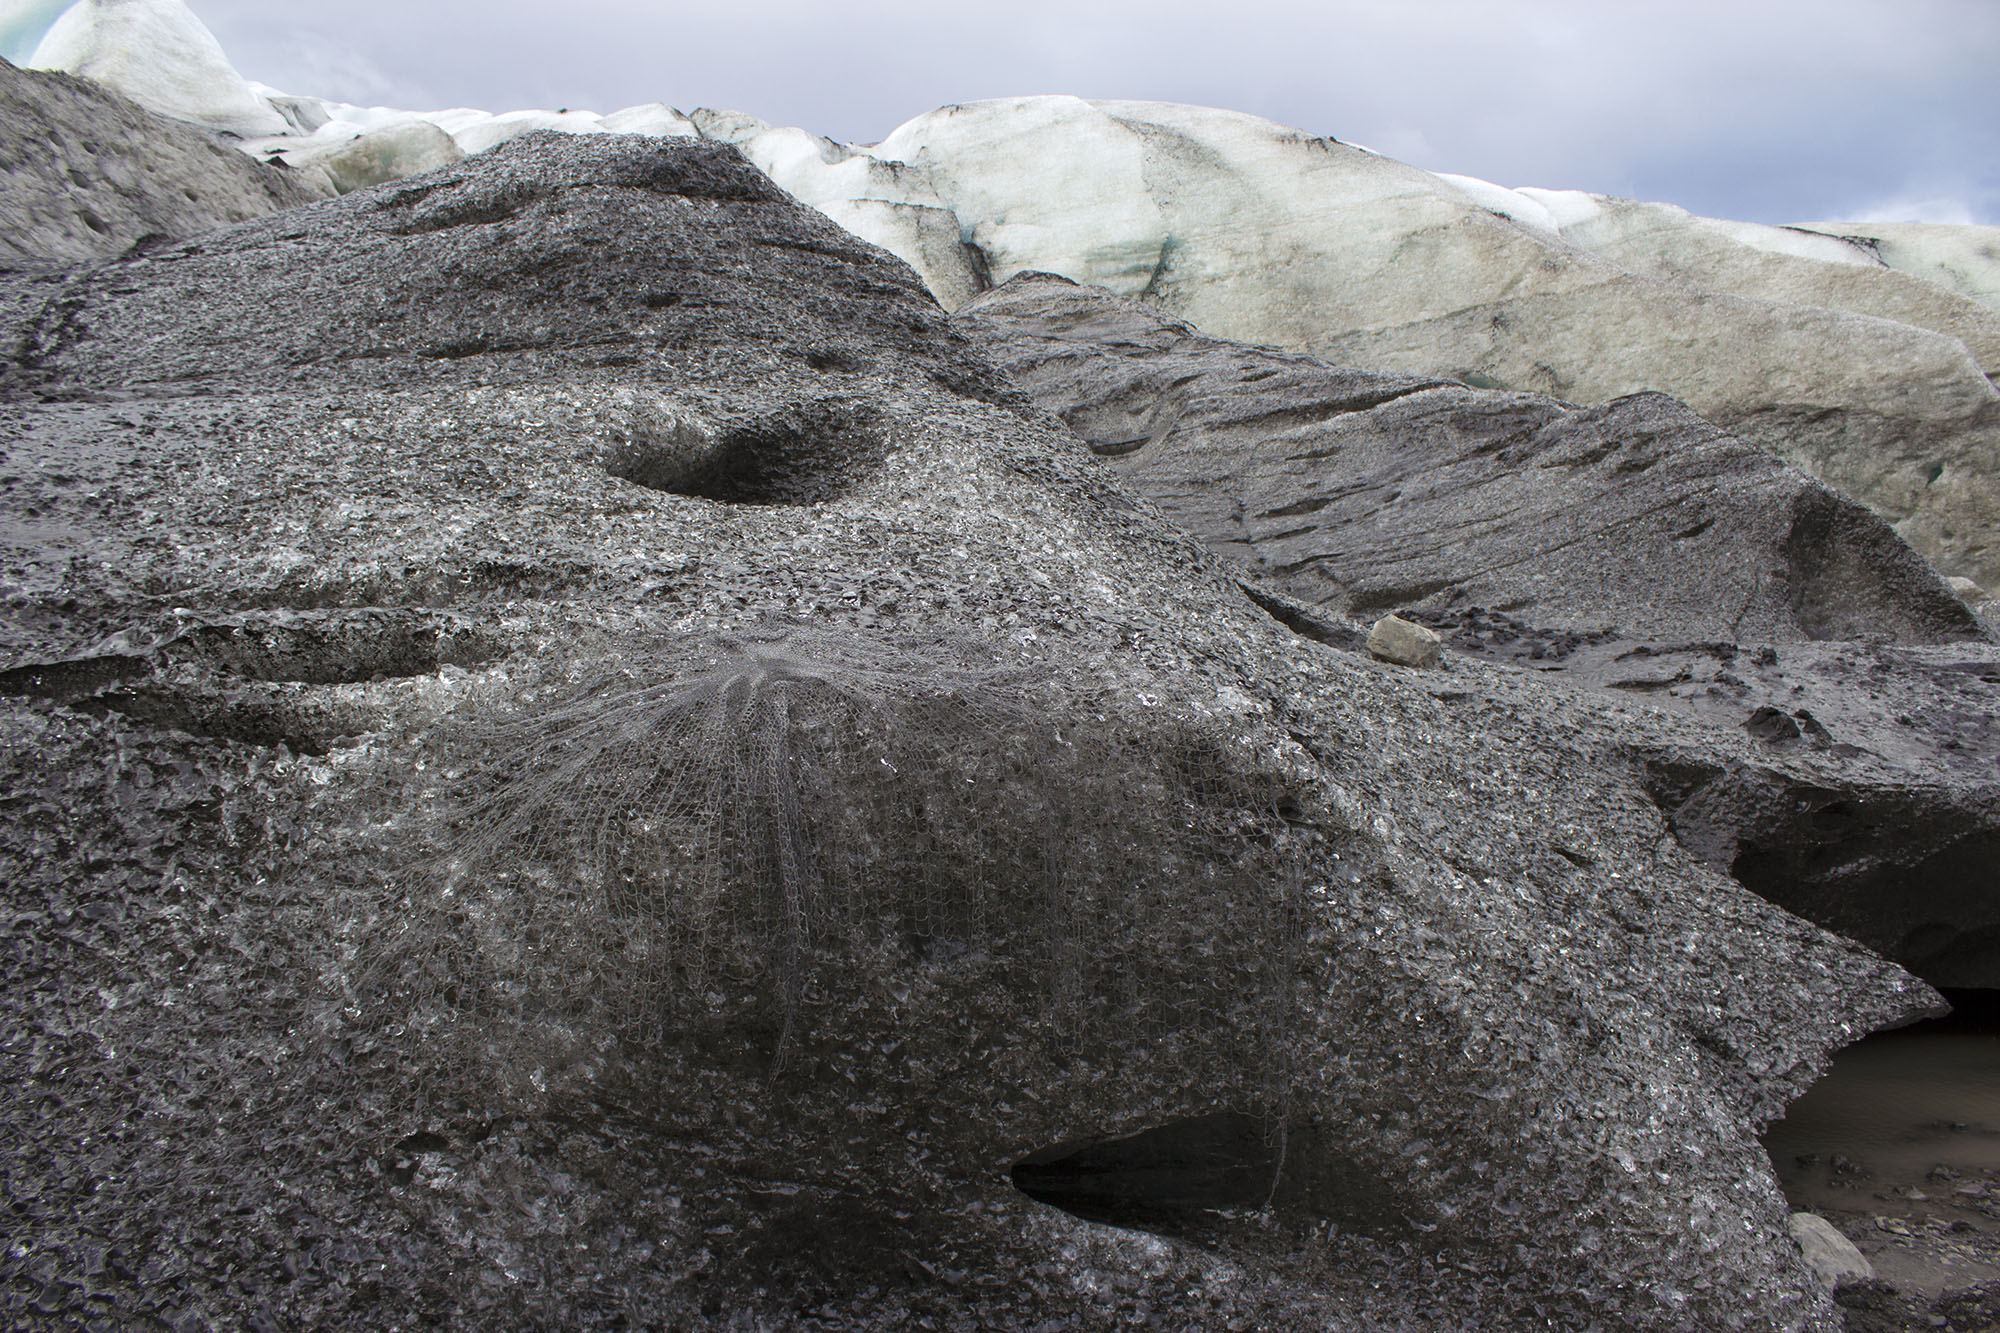 to reinforce a glacier  , 2017 hand-beaded net, glacial tongue site-responsive installation  Fláajökull, Vatnajökull, Iceland